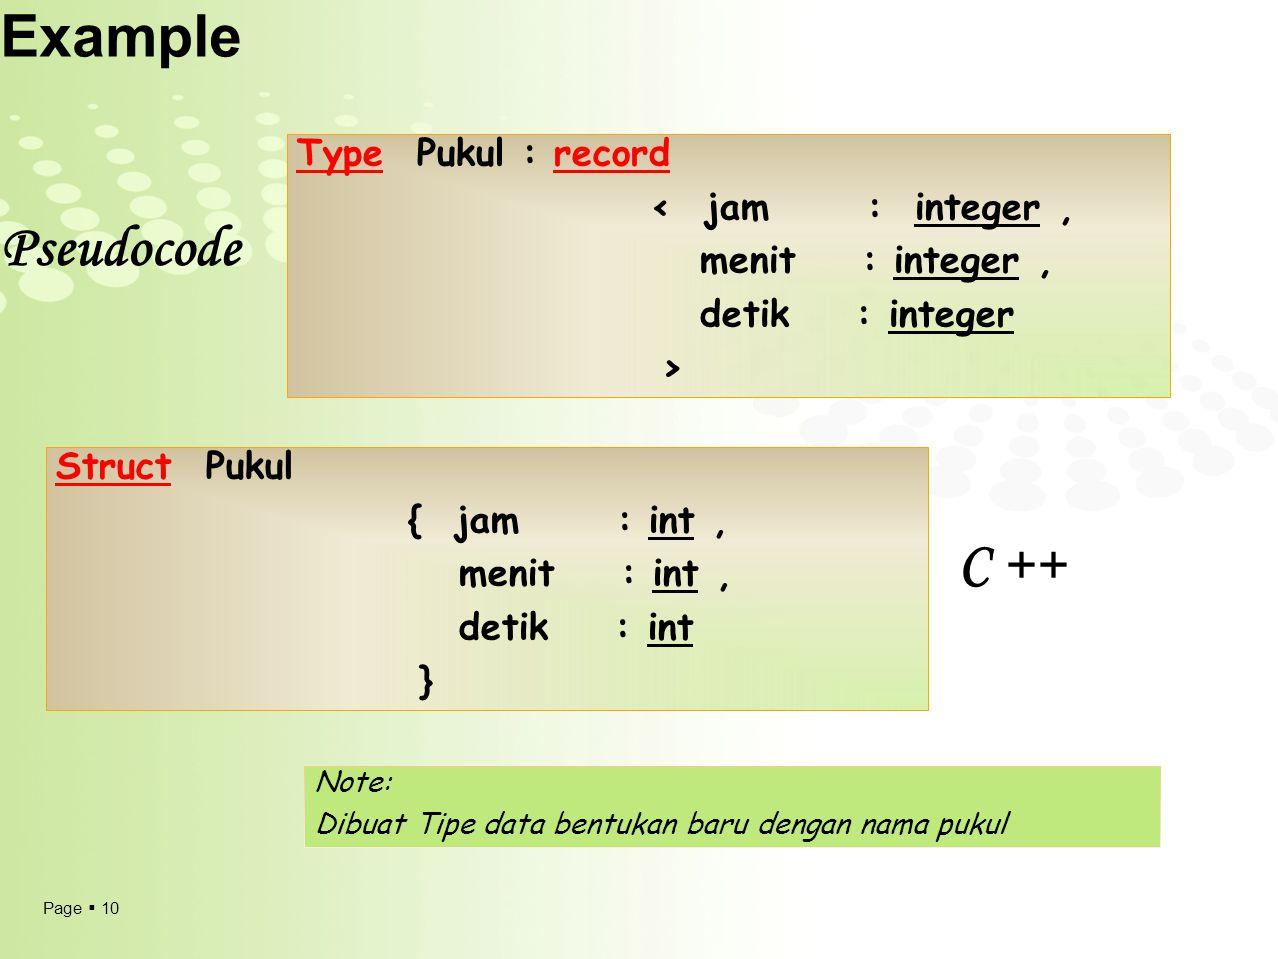 Page  10 Example Type Pukul : record < jam : integer, menit : integer, detik : integer > Struct Pukul { jam : int, menit : int, detik : int } Note: Dibuat Tipe data bentukan baru dengan nama pukul Pseudocode C ++